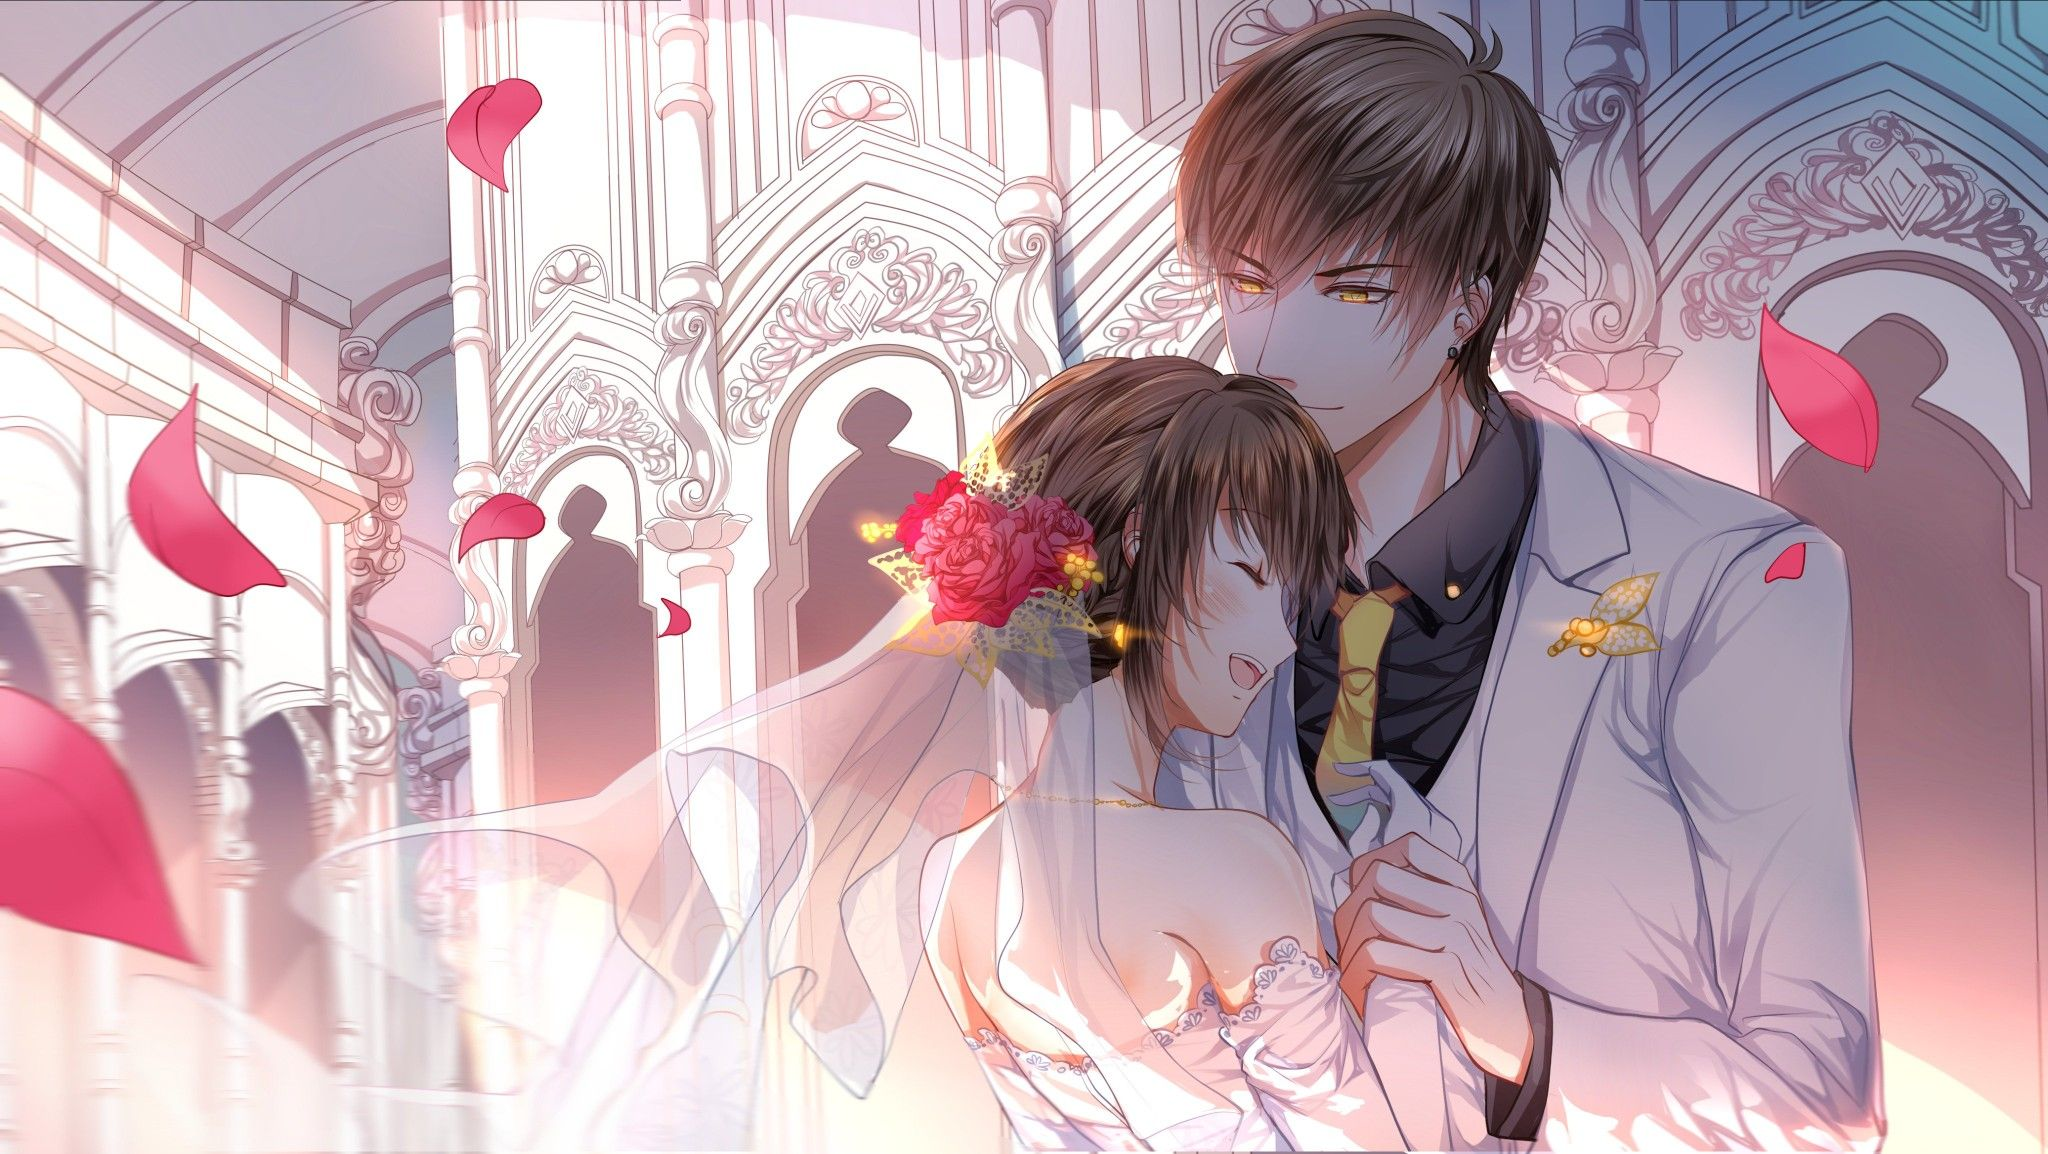 Gambar oleh Ziiee pada Wallpaper anime♡ Pasangan